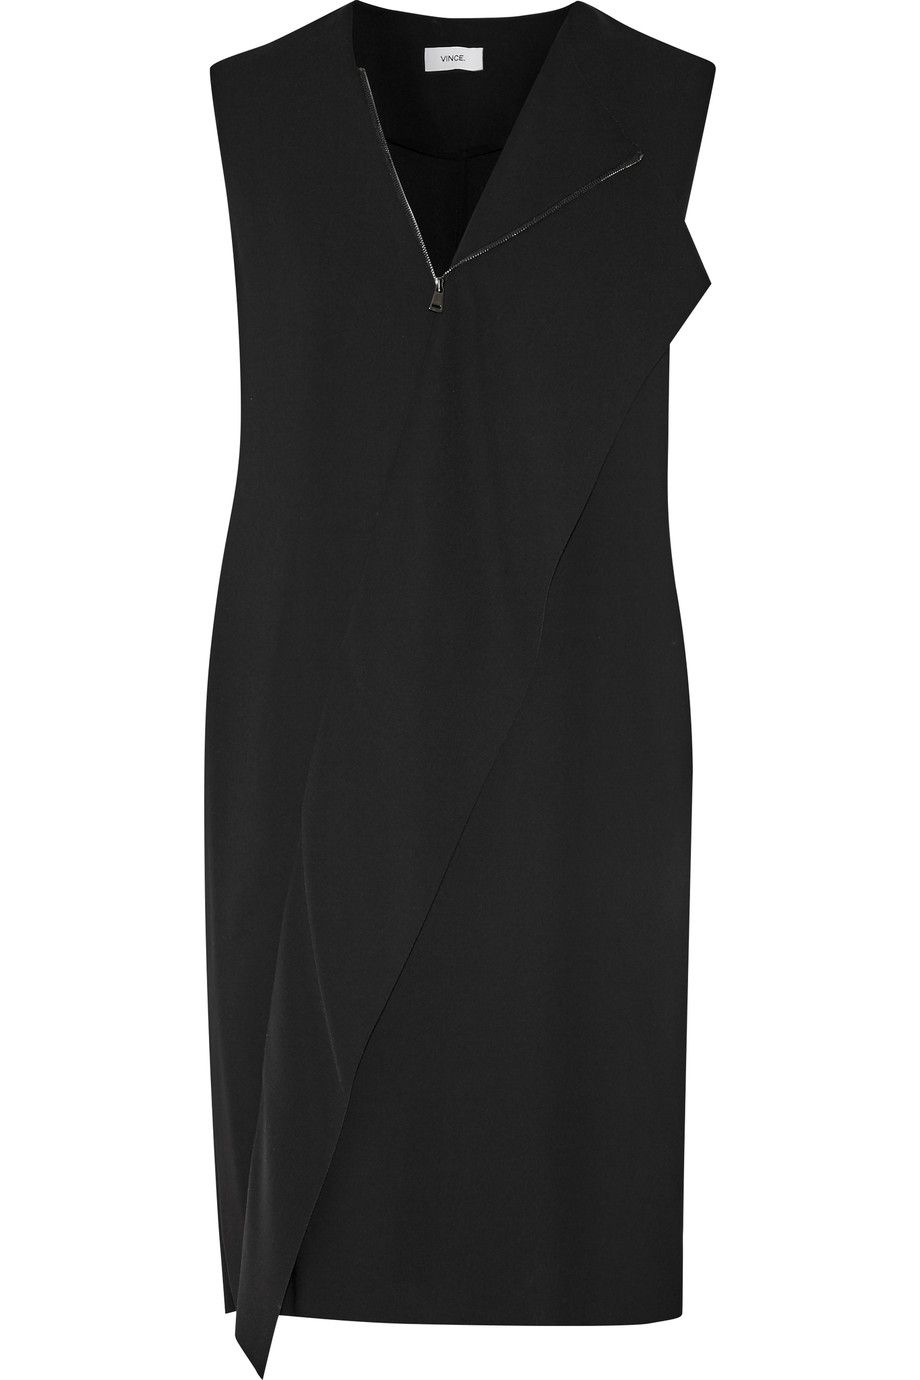 Draped Crepe Mini Dress Dresses Designer Clothes Sale Discount Designer Clothes